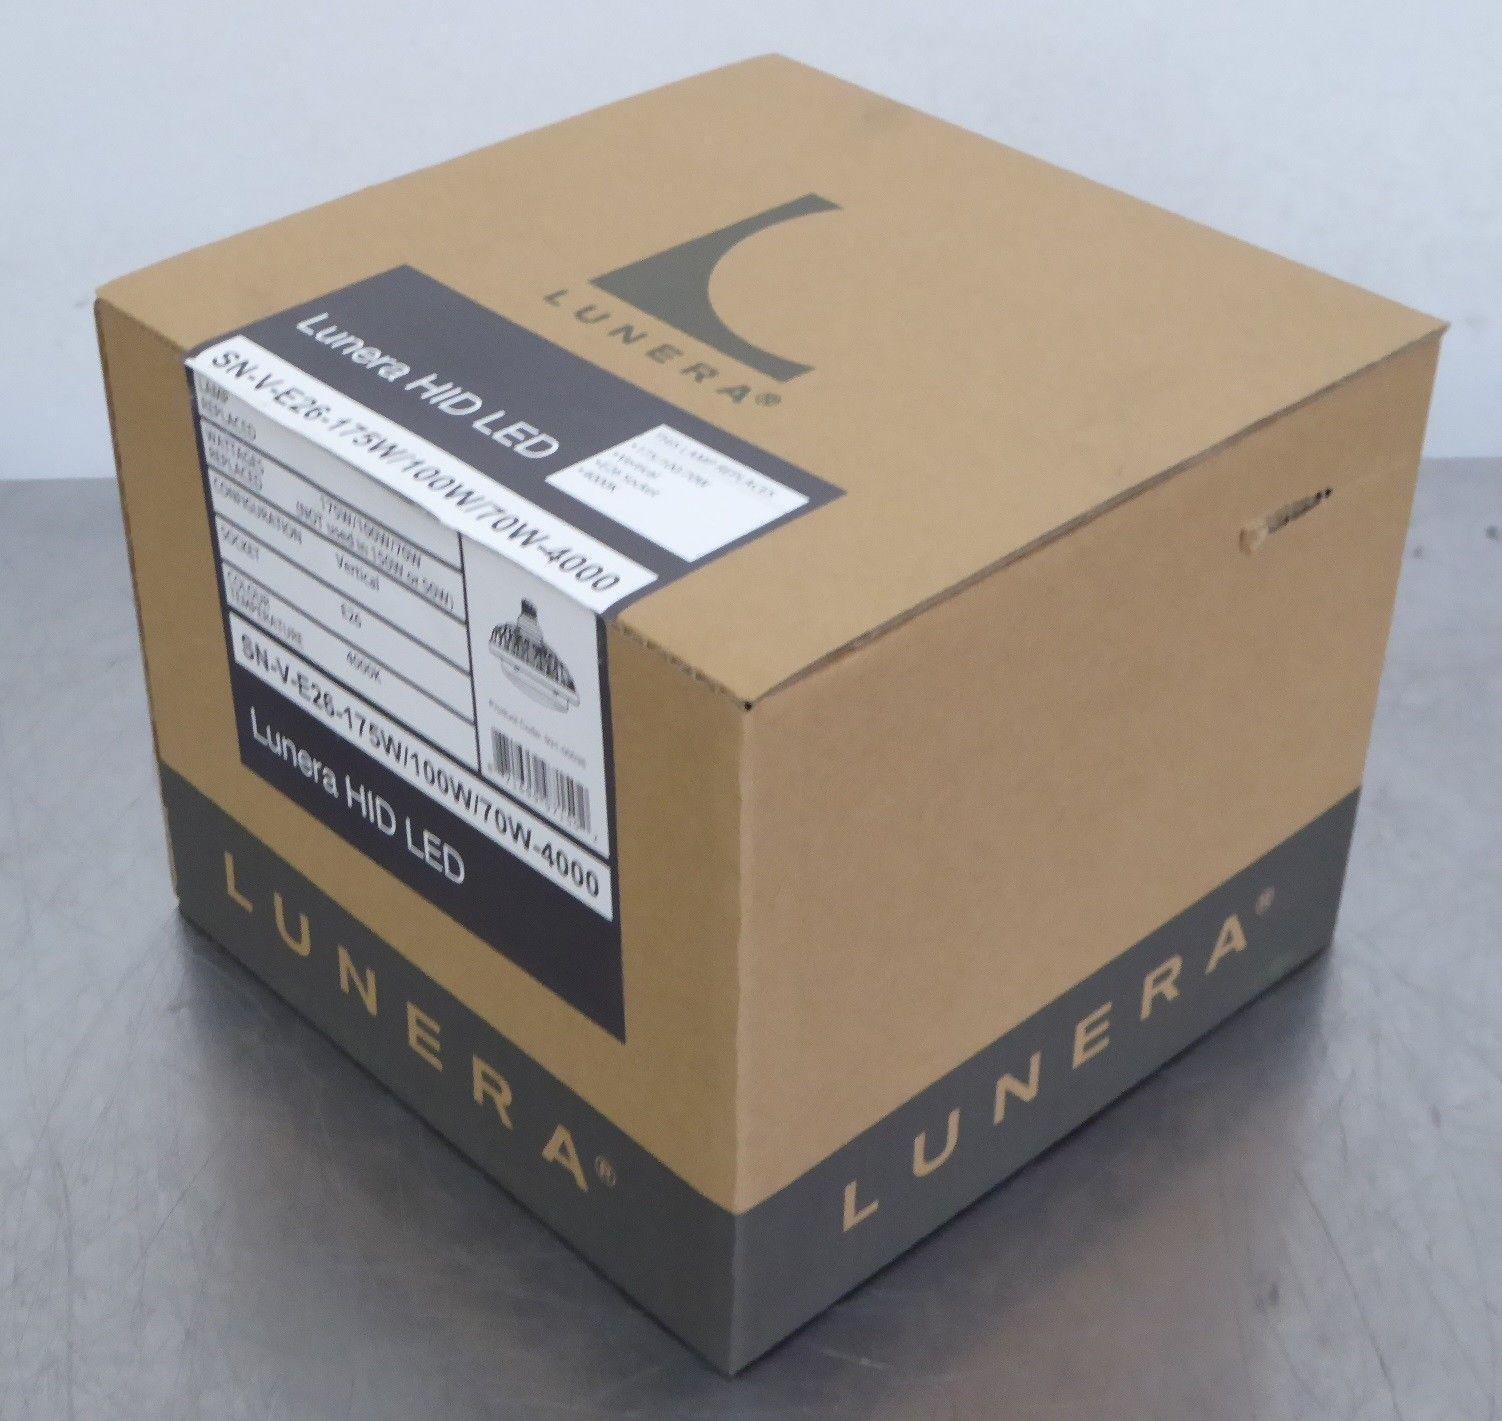 TB Lunera Susan HID LED SN-V-E26-175W/100W/70W-5000 Lamp E26 Socket, 5000K